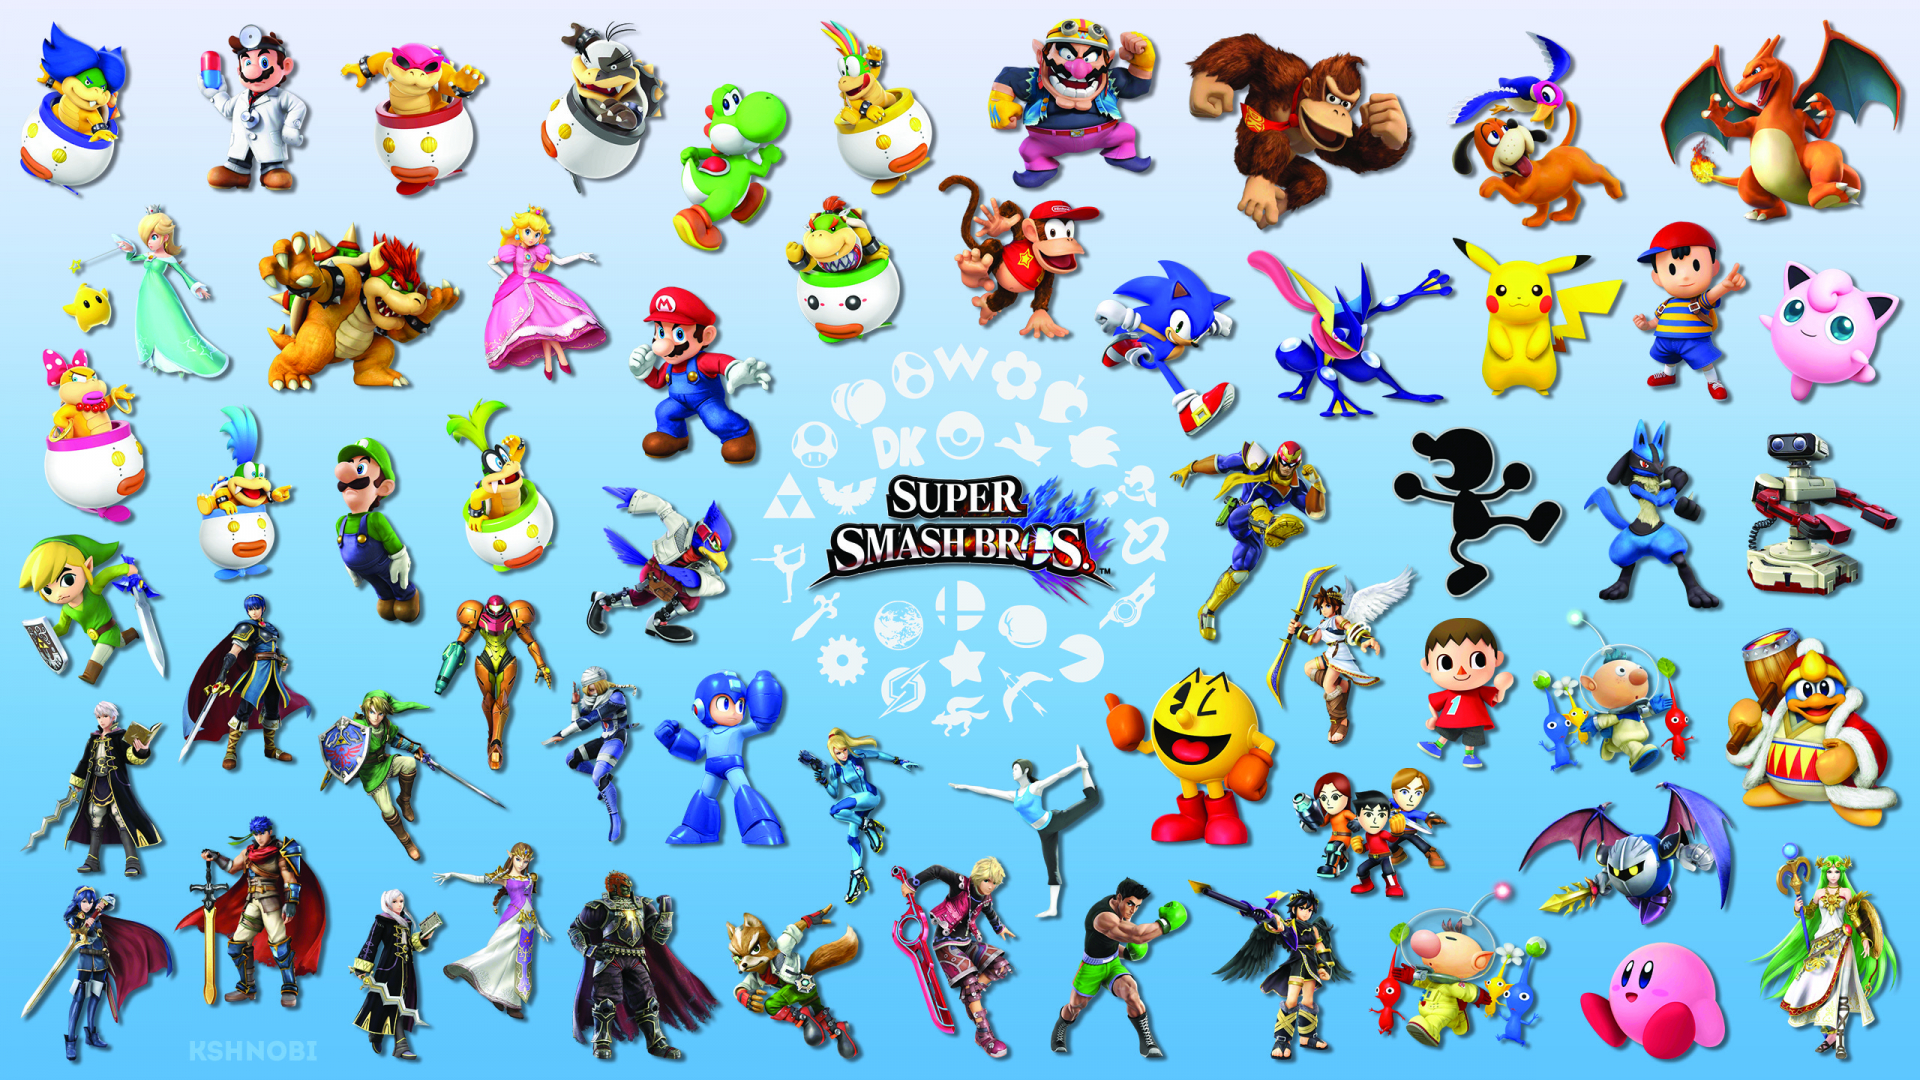 Free Download Super Smash Bros 4 Logo Wallpaper Super Smash Bros 4